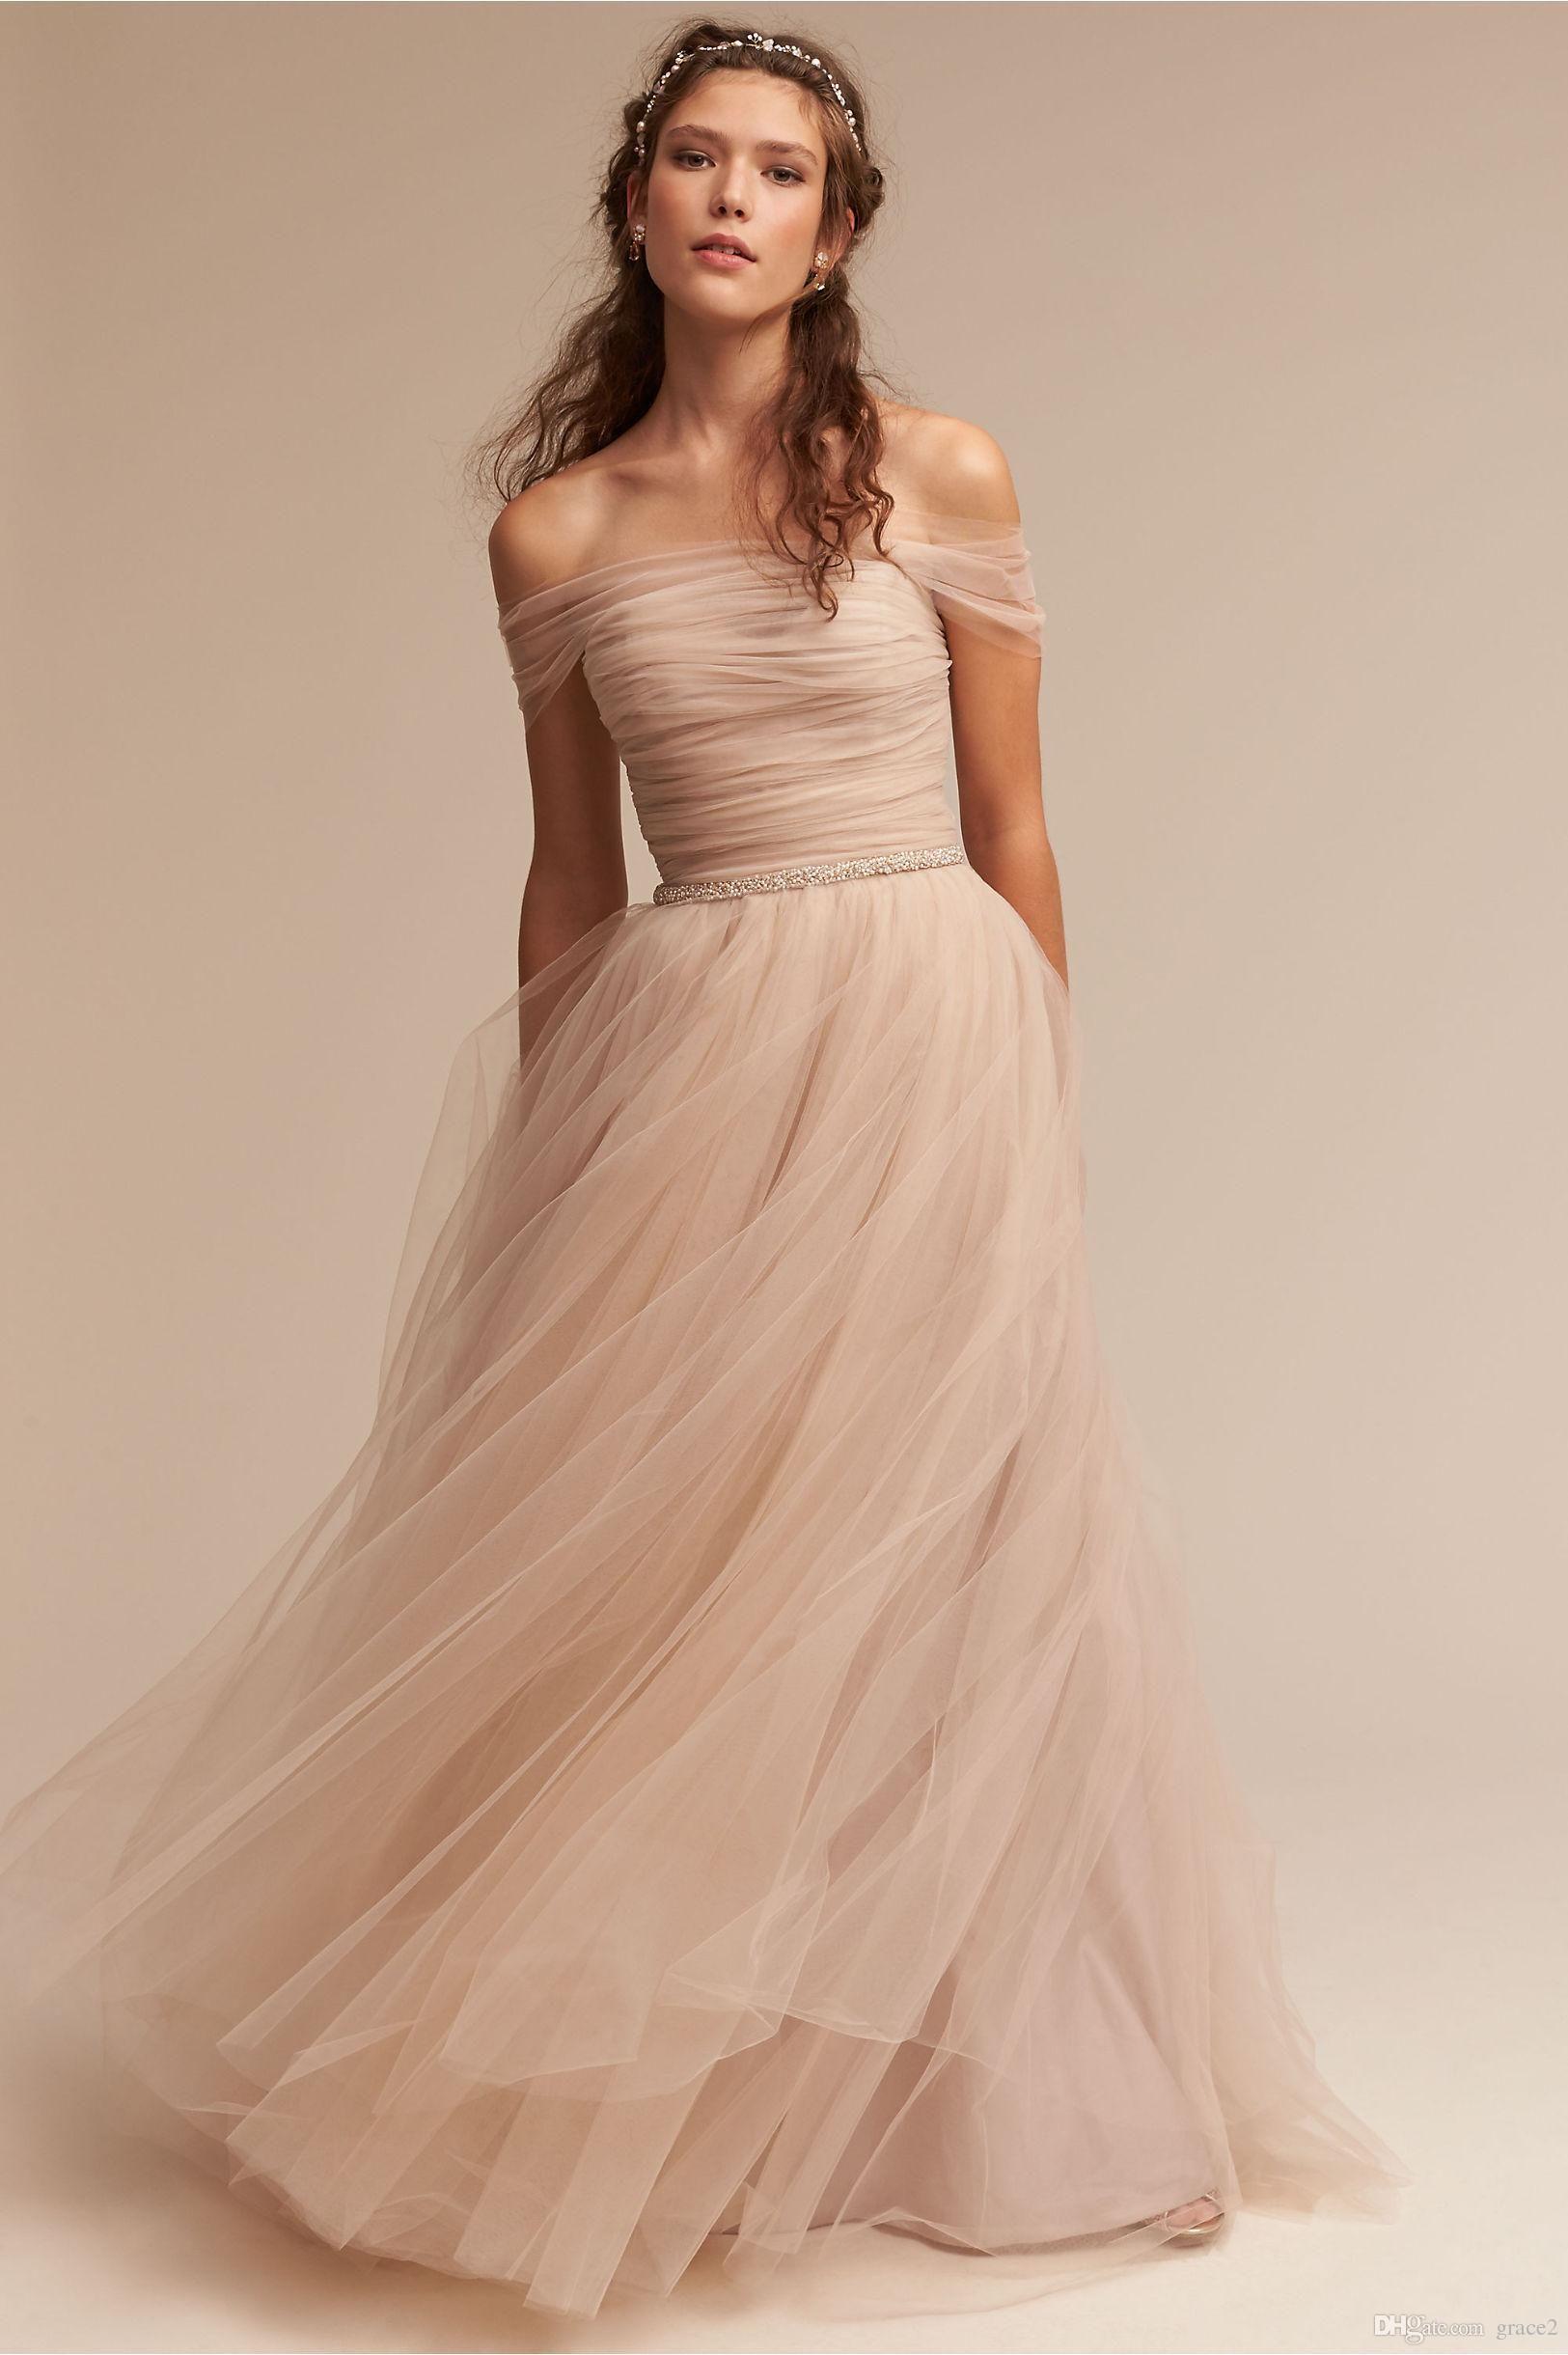 Blush wedding dress with sleeves  Modern Blush Wedding Dresses  Bhldn Vestido De Noiva with